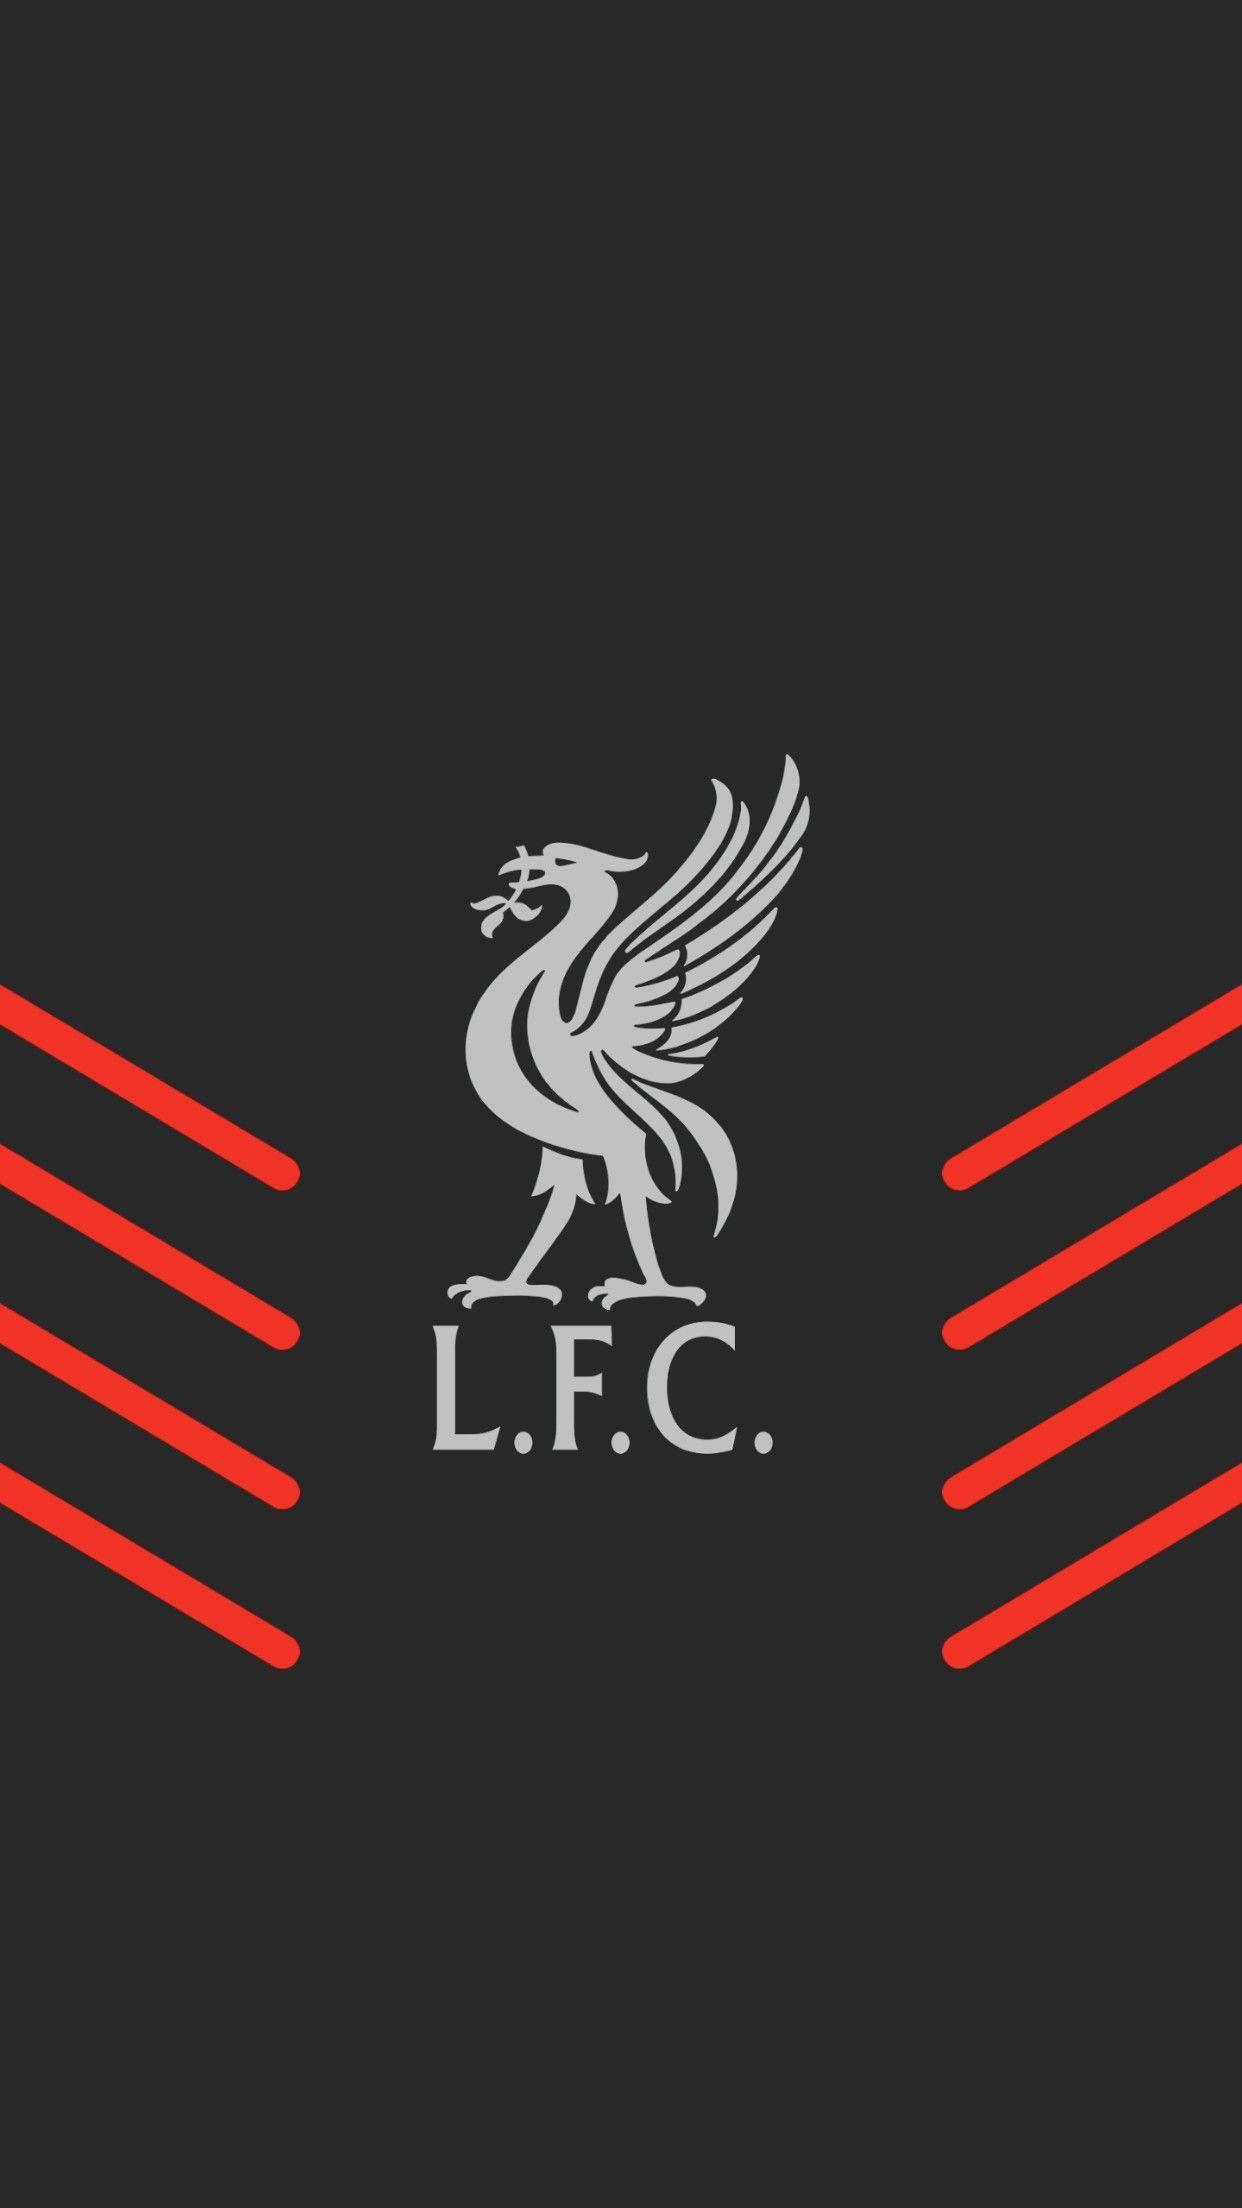 40 Gambar Wallpaper Hd Iphone Liverpool Terbaru 2020 Liverpool Gambar Bola Kaki